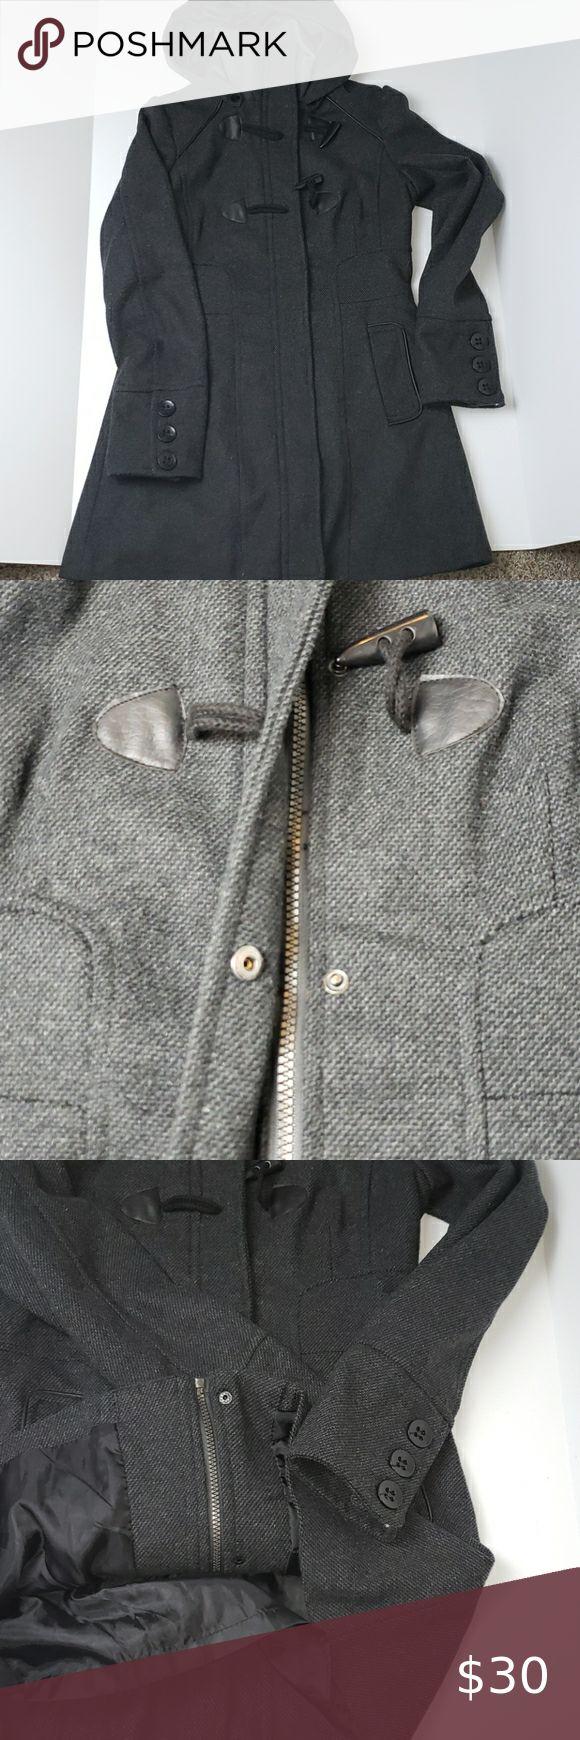 Yoki Coat Coats Jackets Women Clothes Design Leather Jackets Women [ 1740 x 580 Pixel ]